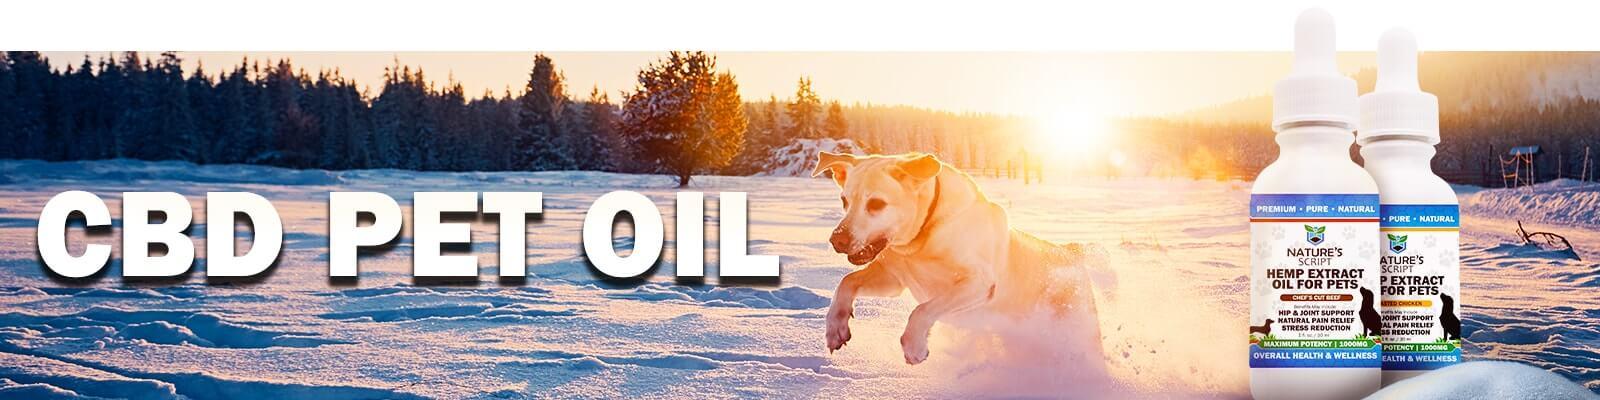 CBD Pet Oil banner